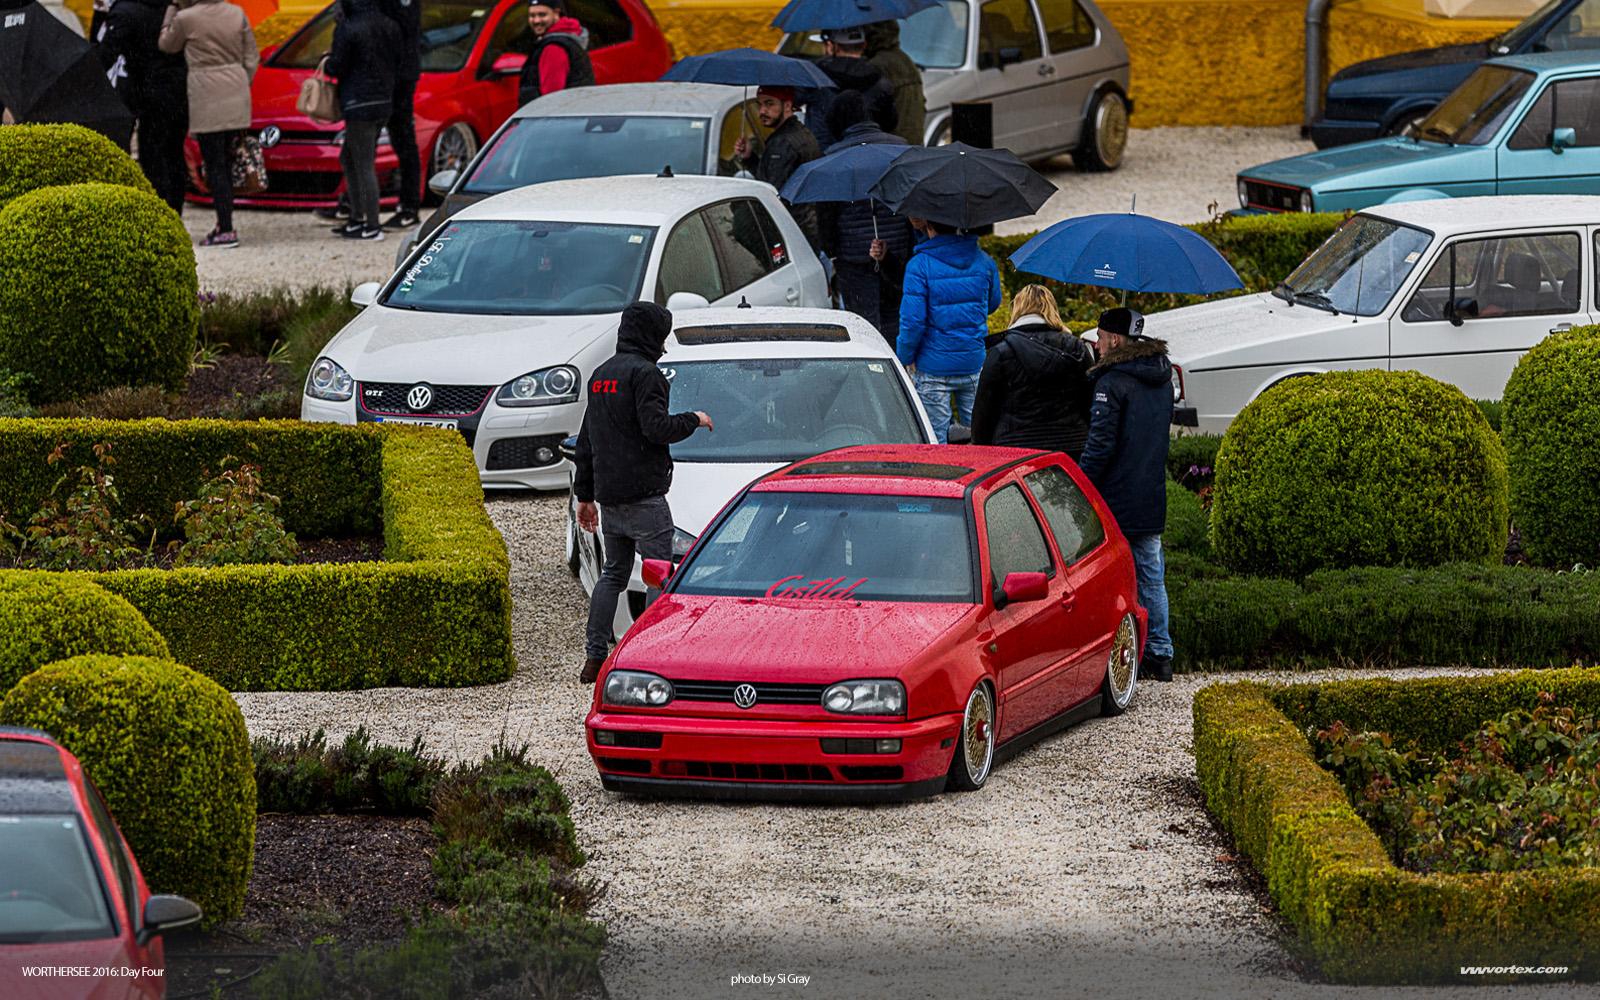 Audi-quattro-e-tron-concept-Forum-Neckarsulm-310